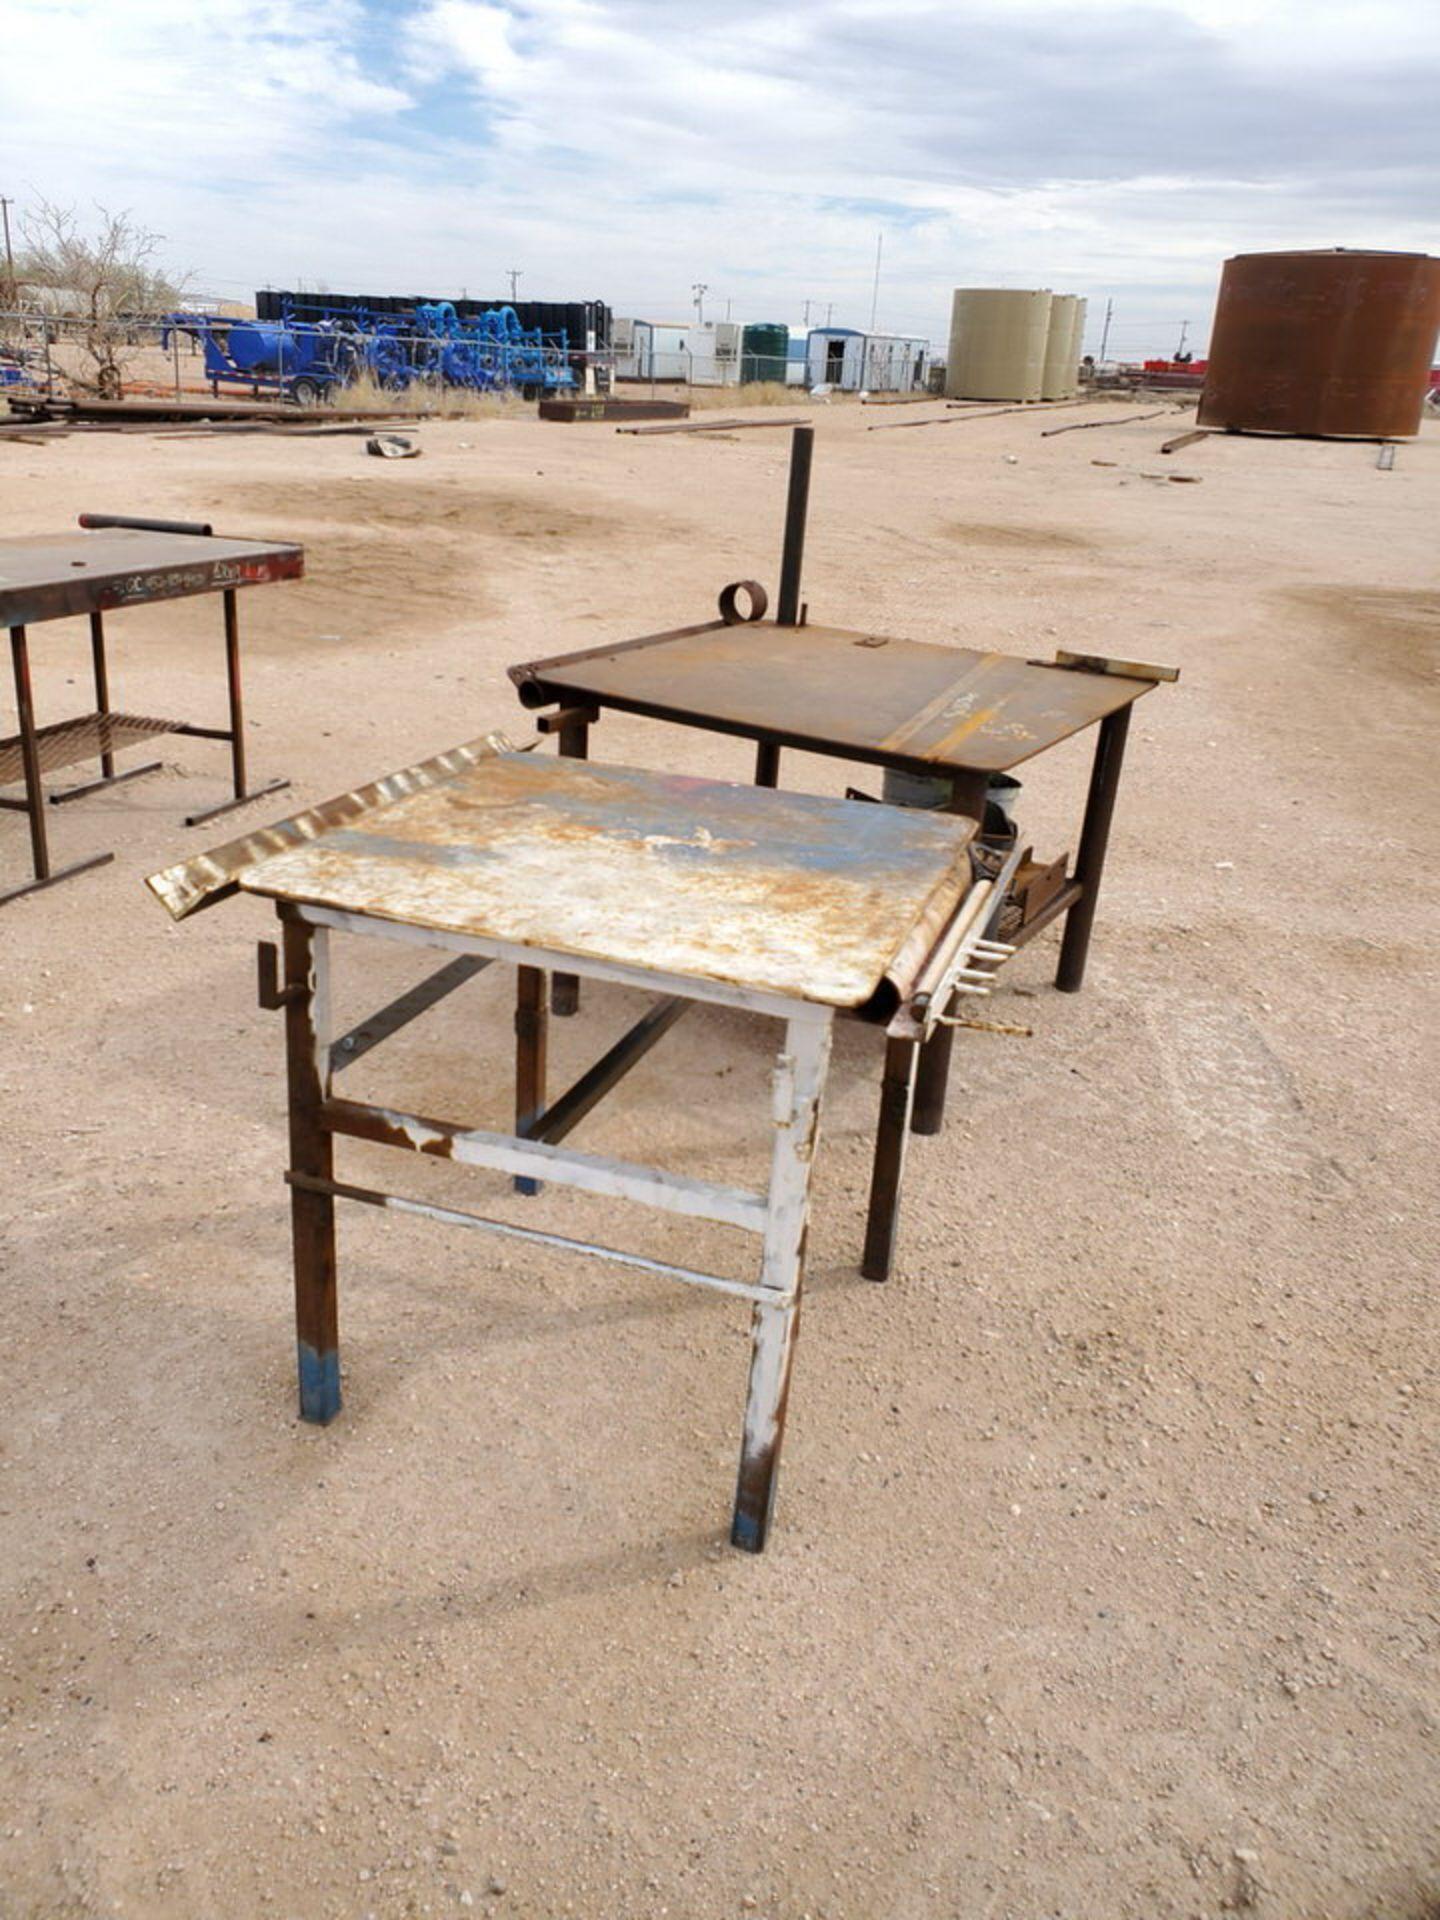 "(2) Stl Welding Tables (1) 43"" x 48"" x 36"", (1) 39"" x 36"" x 36"" - Image 3 of 5"